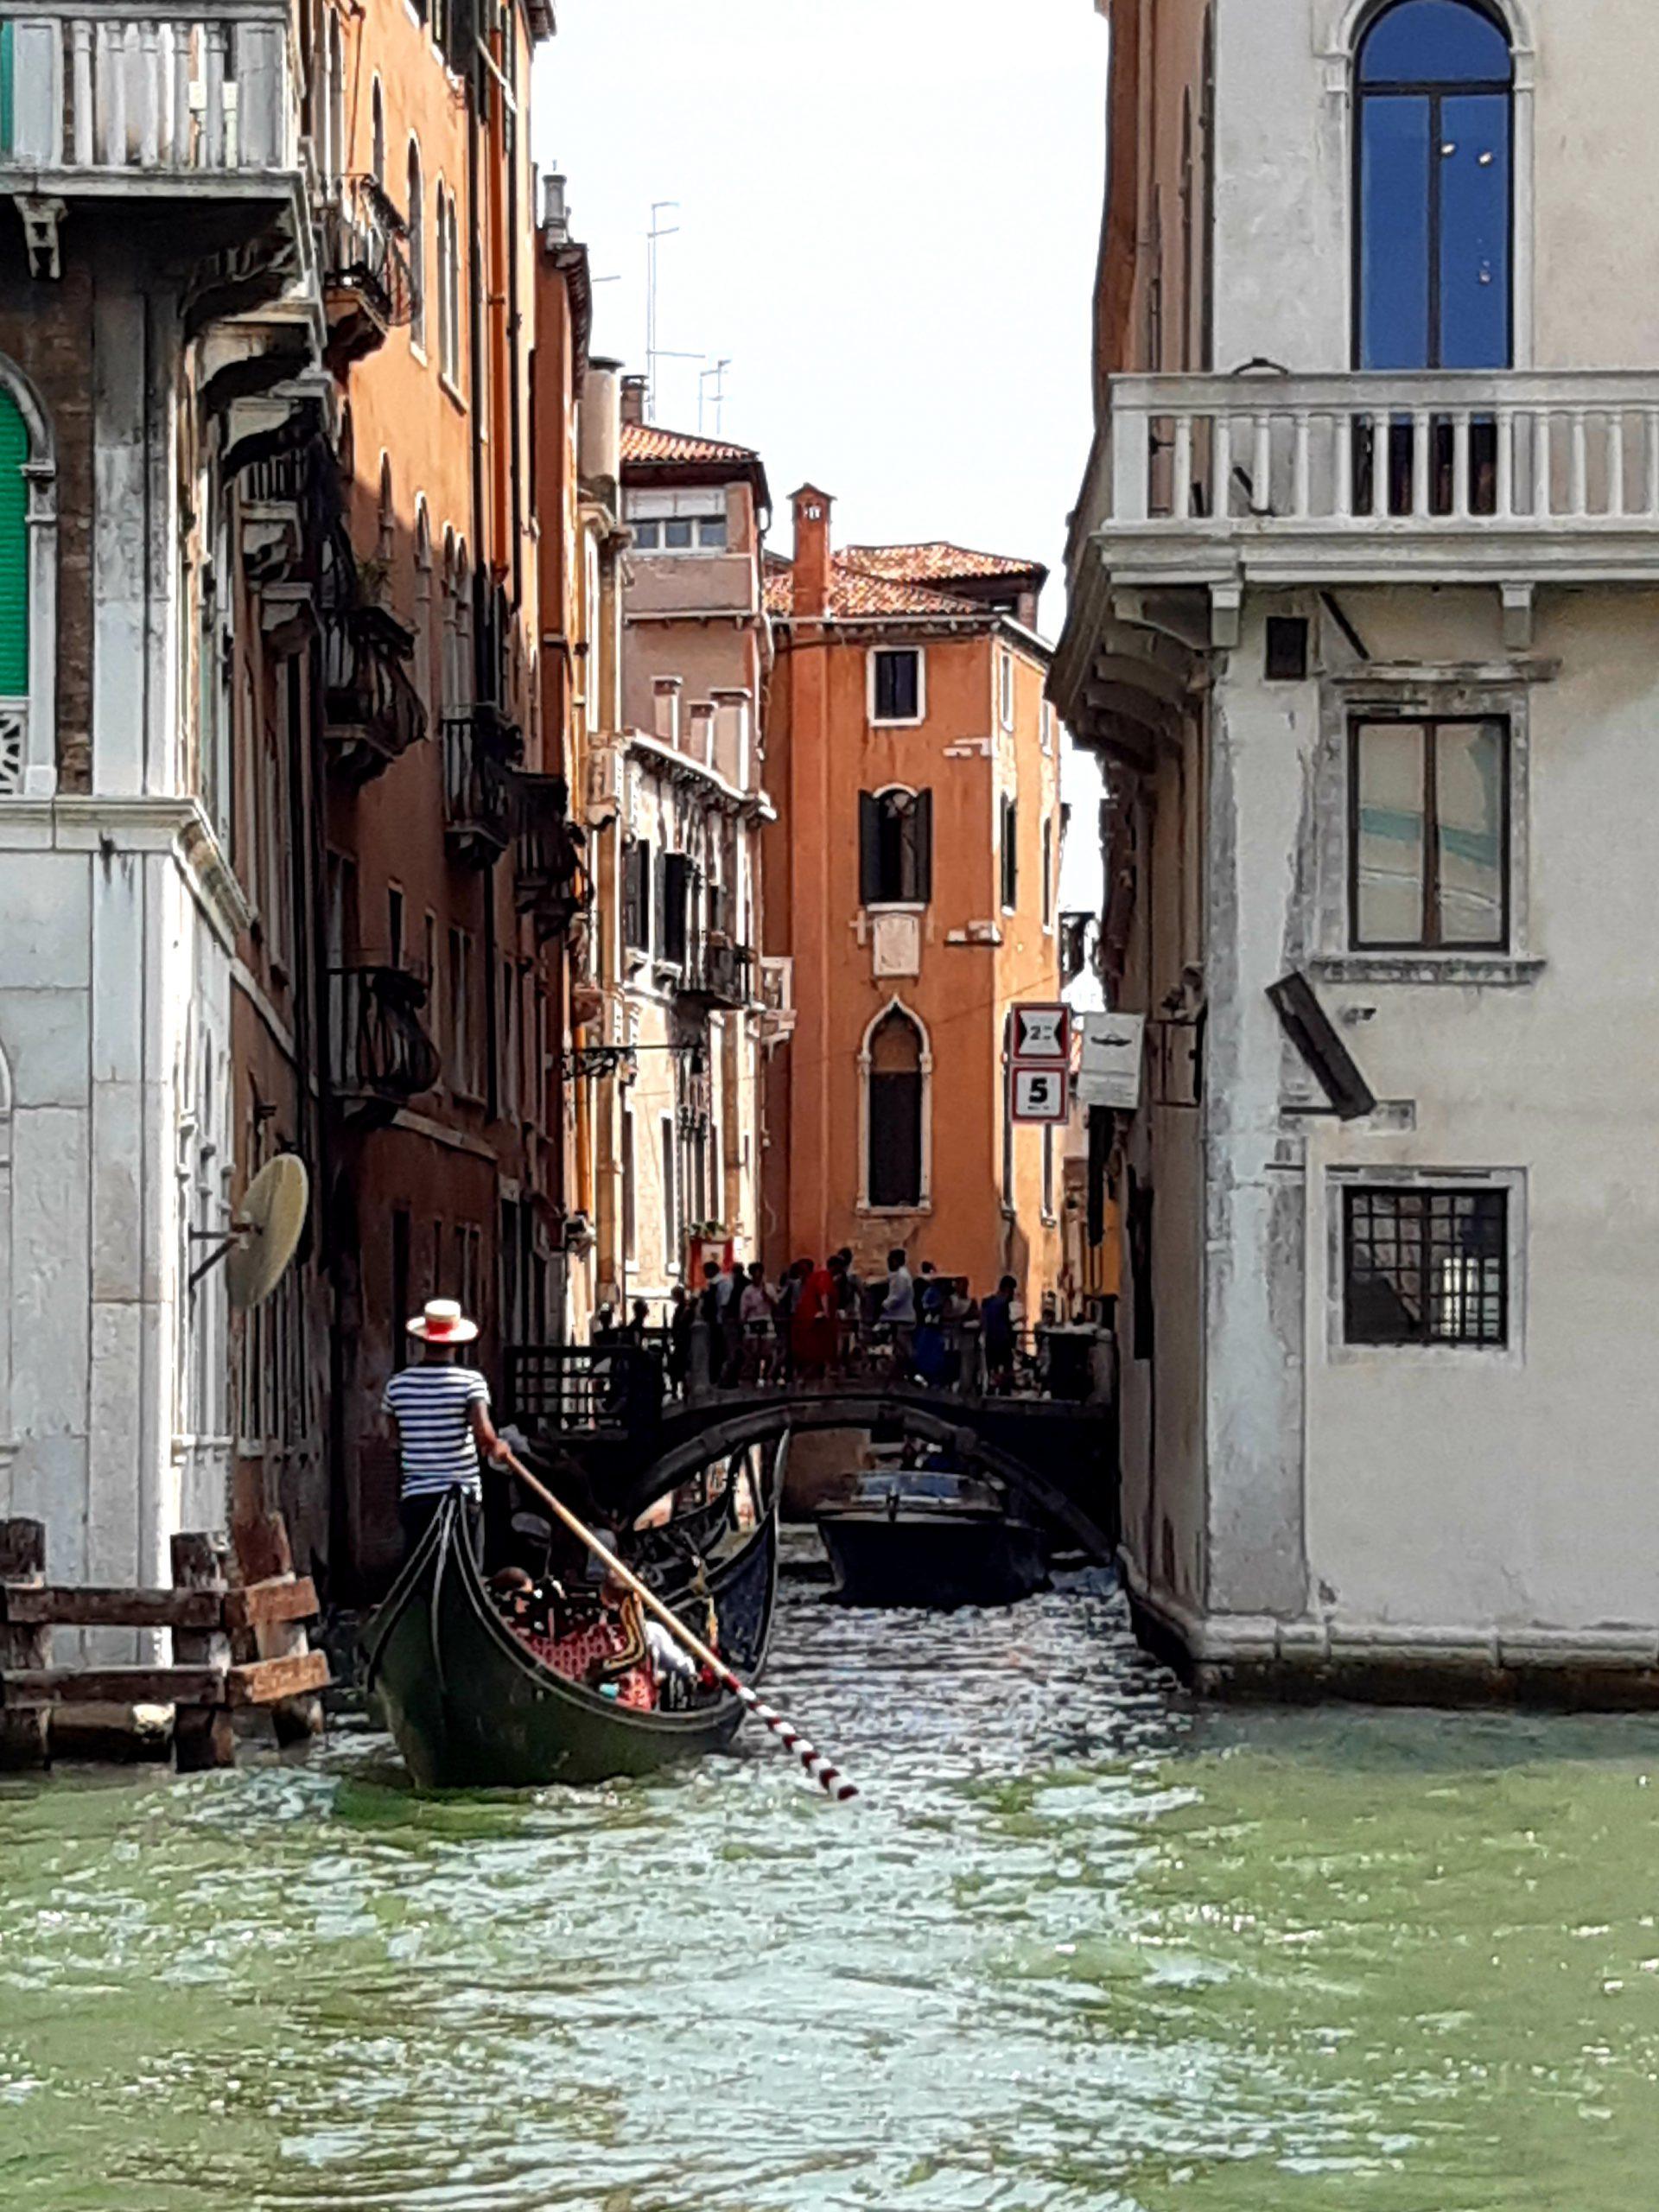 Gondel in den Kanälen von Venedig, Reiseblog